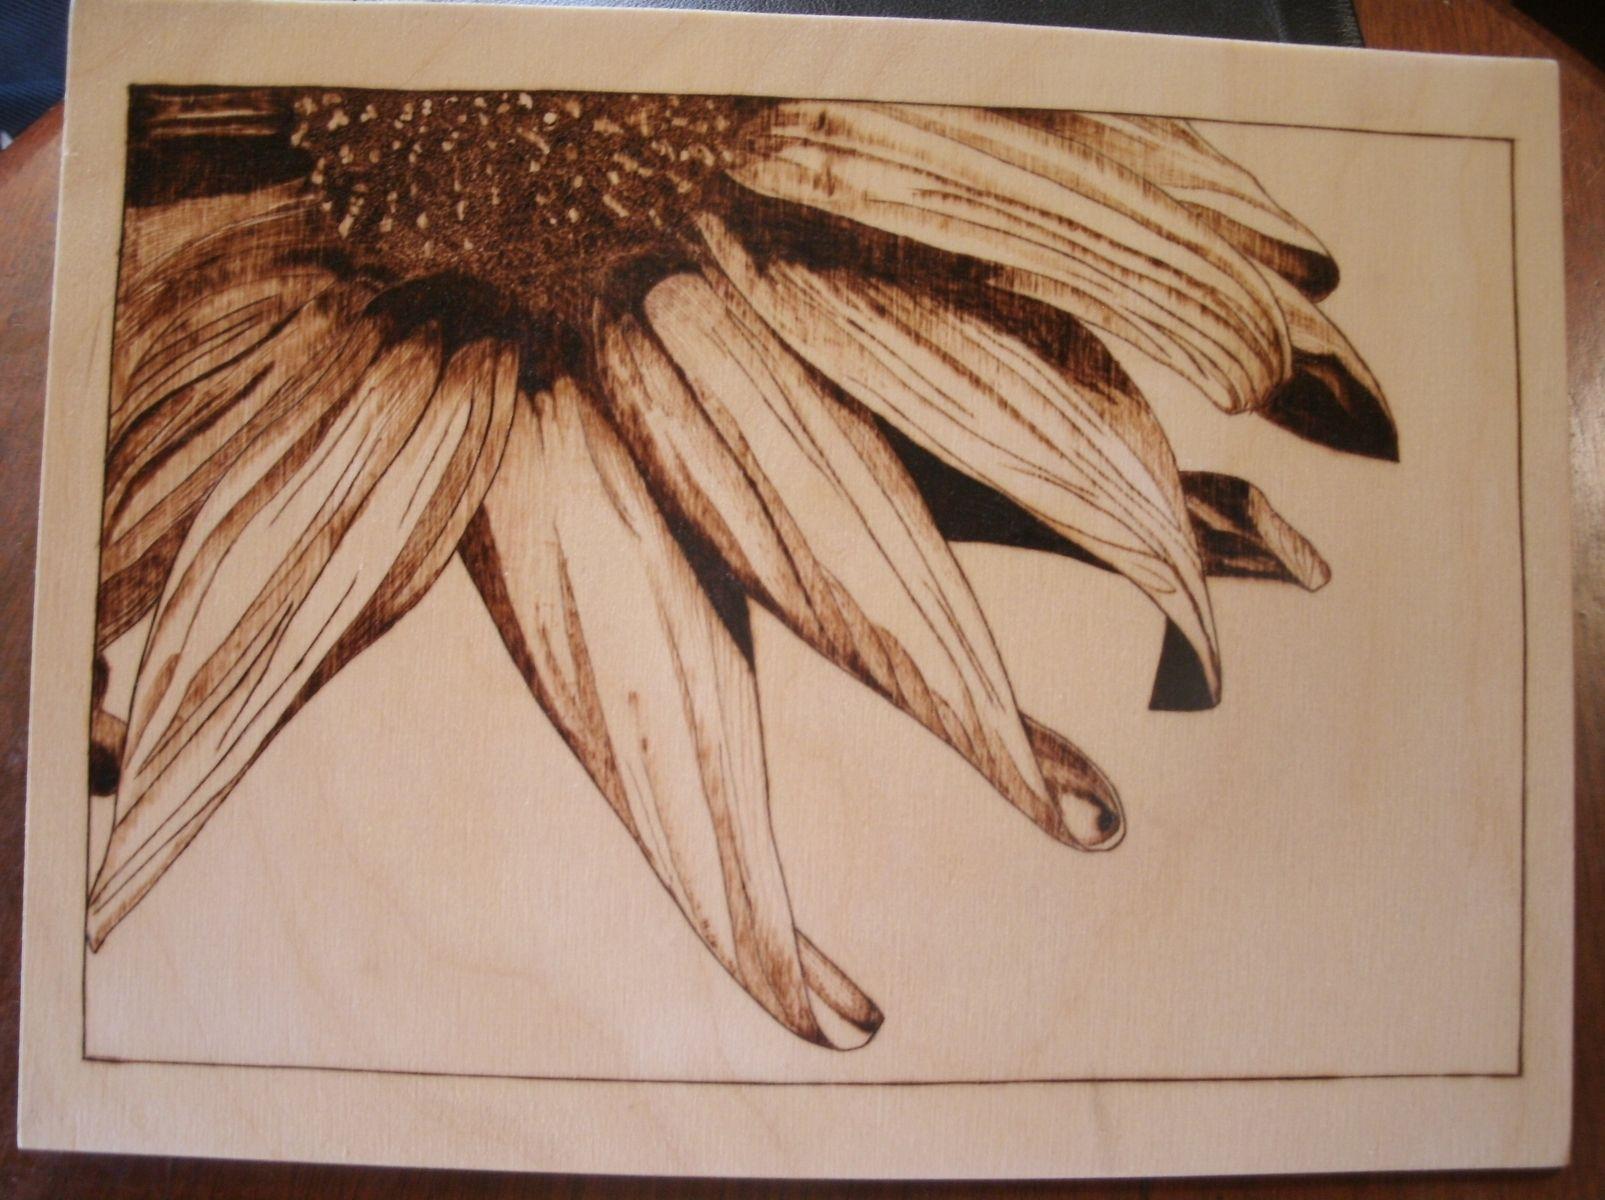 Sunflower Wood Burning Patterns